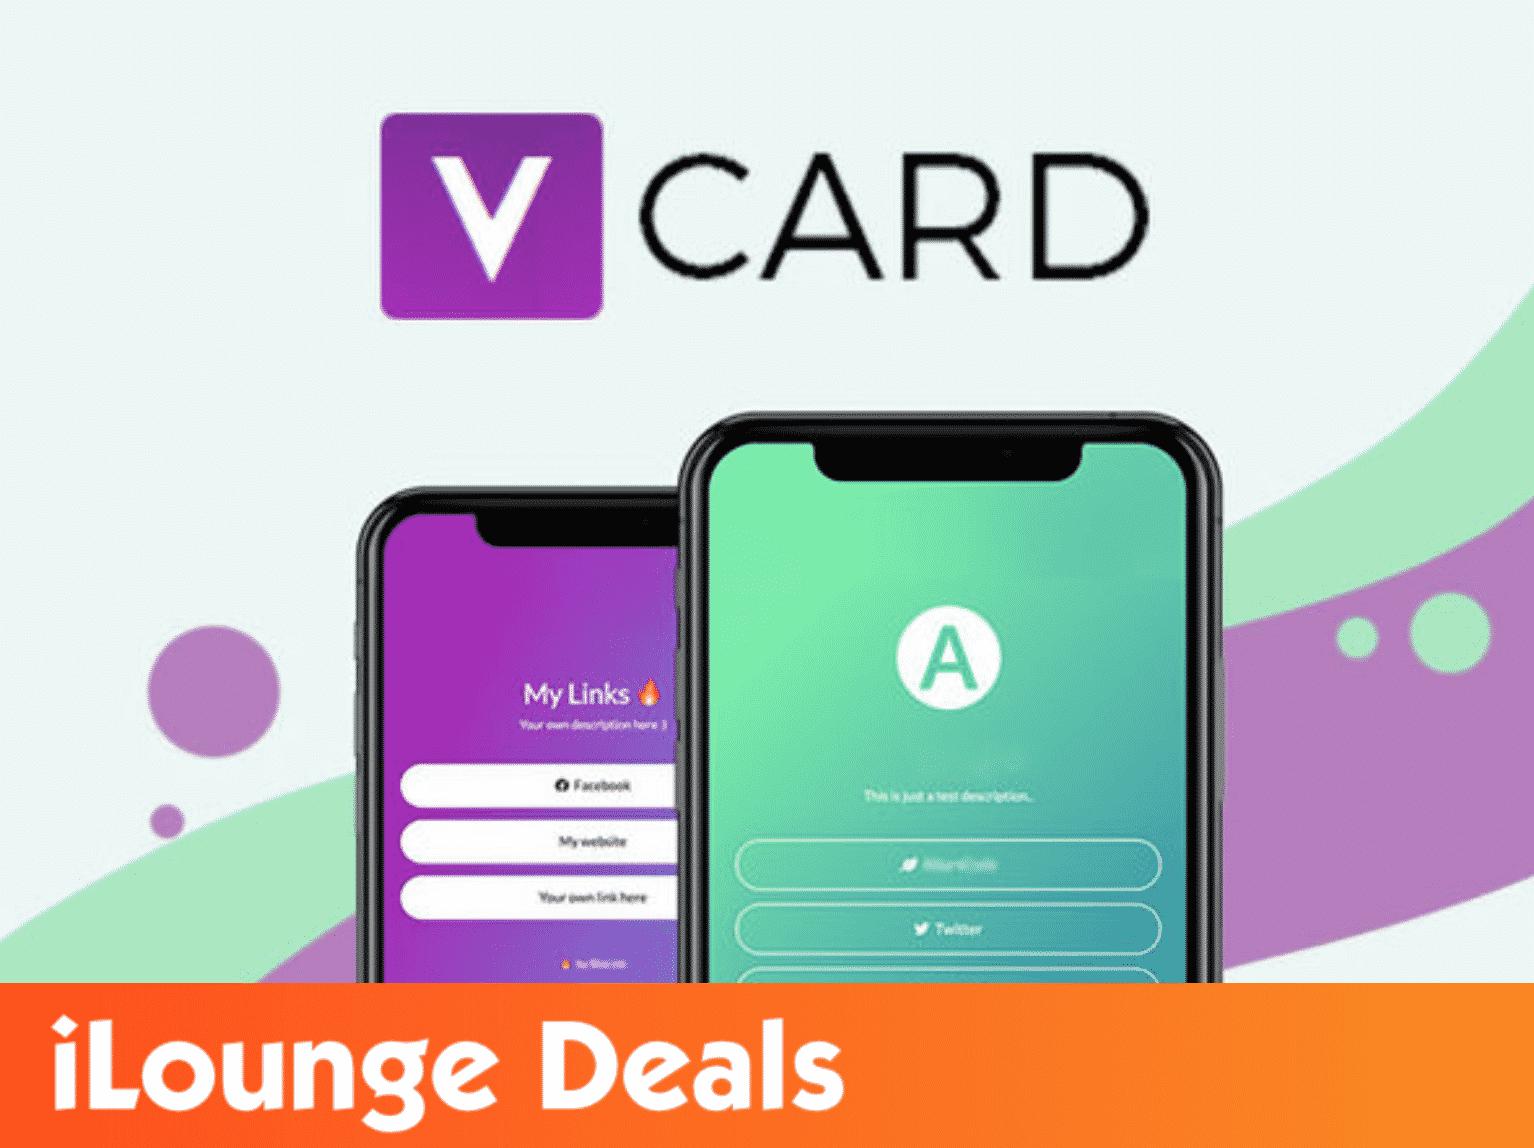 vCard - Your Virtual Business Card